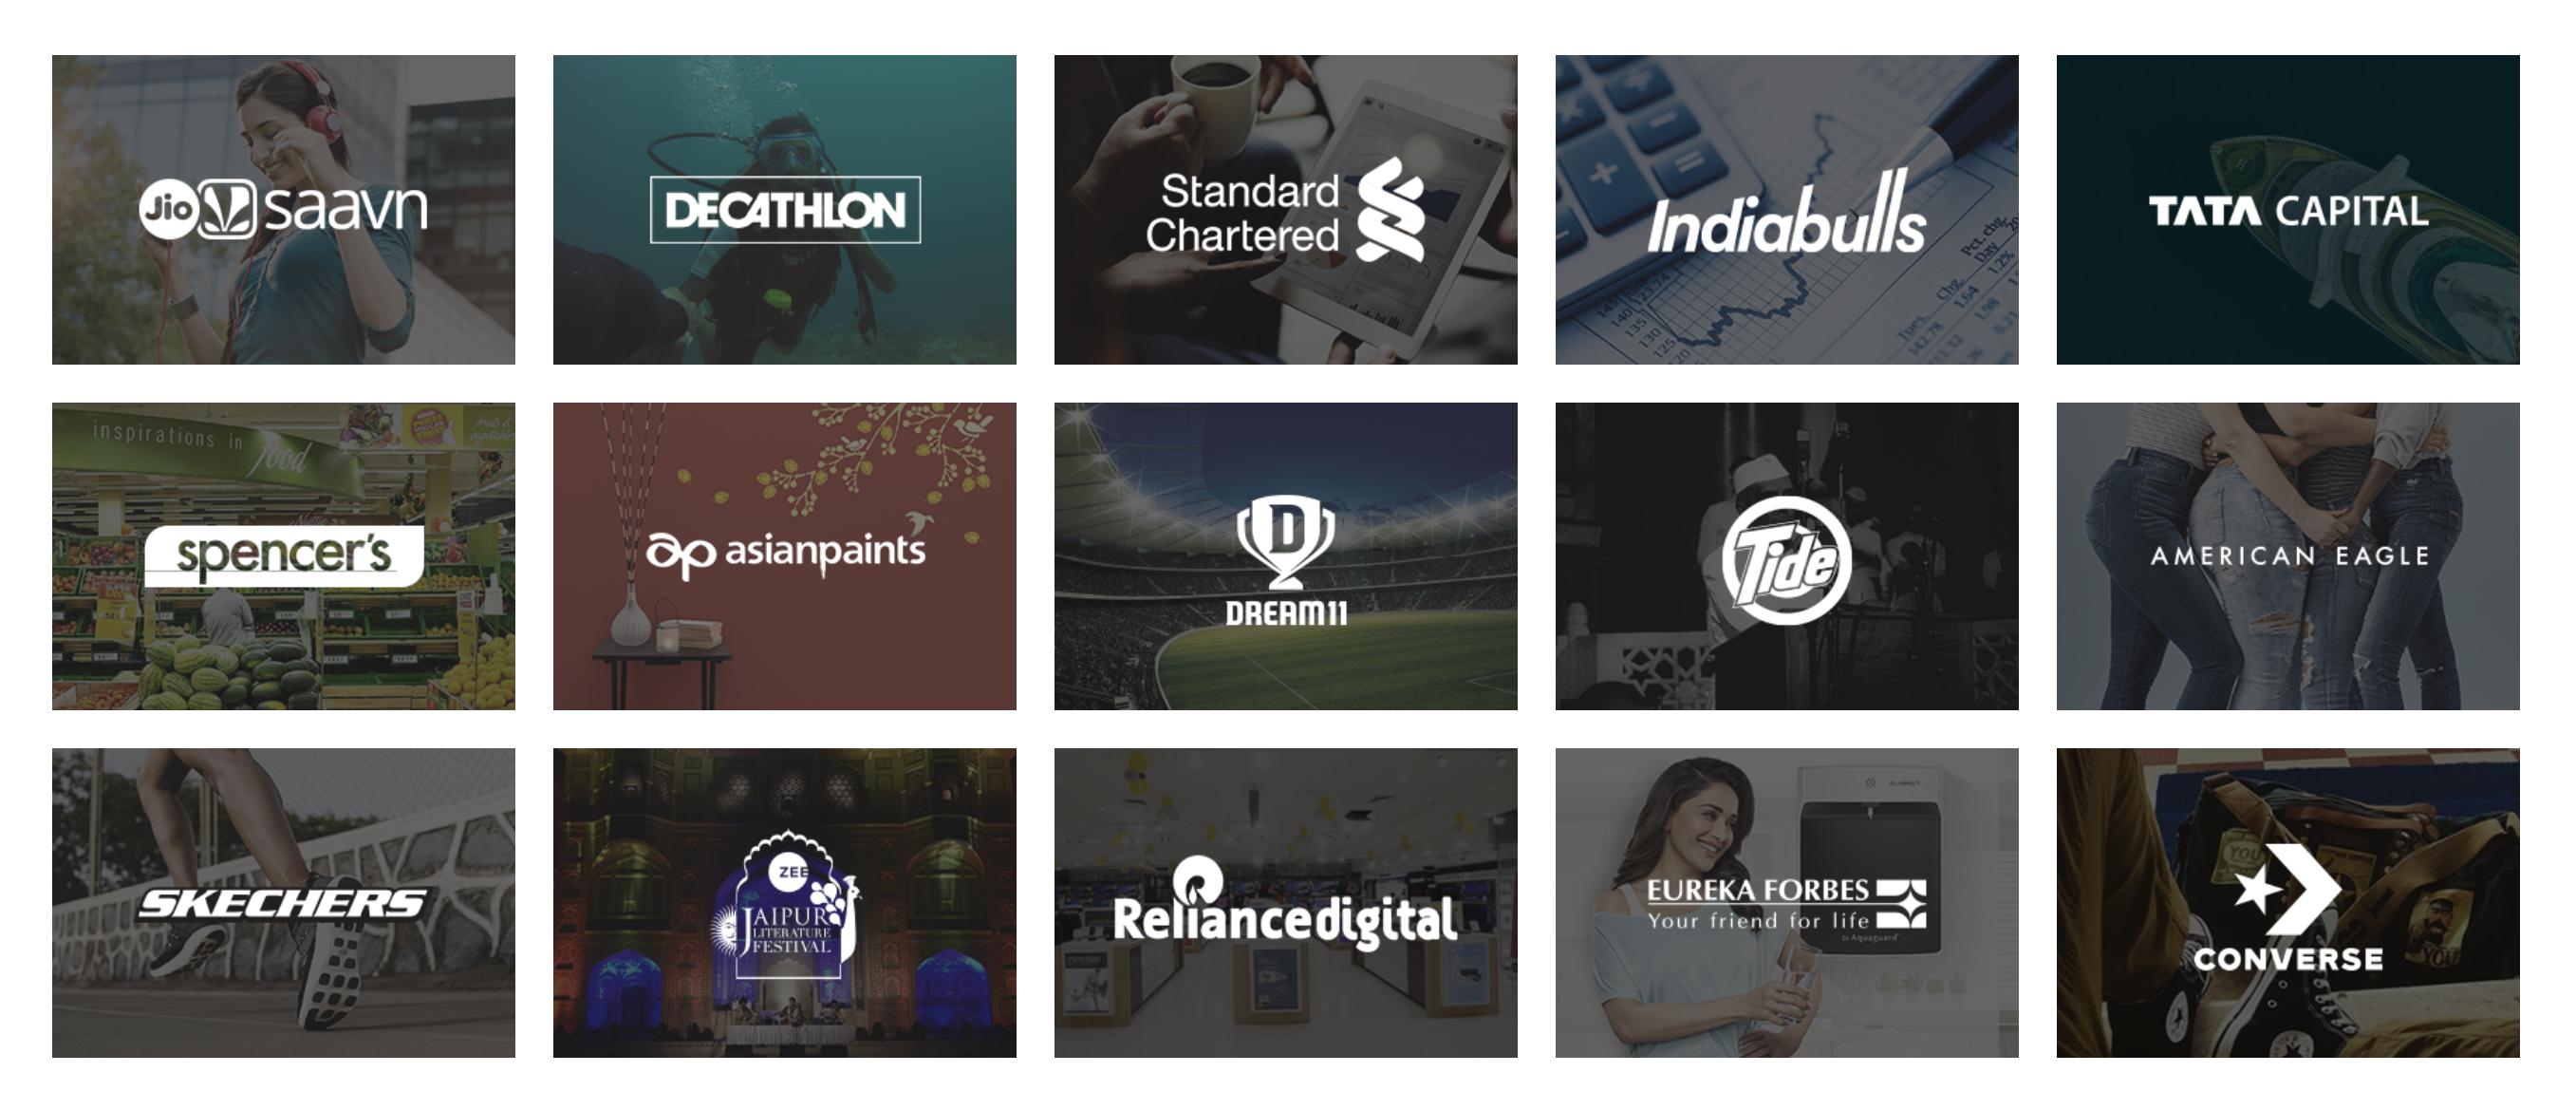 Kinnect - Digital Marketing Agencies in Mumbai - Clients